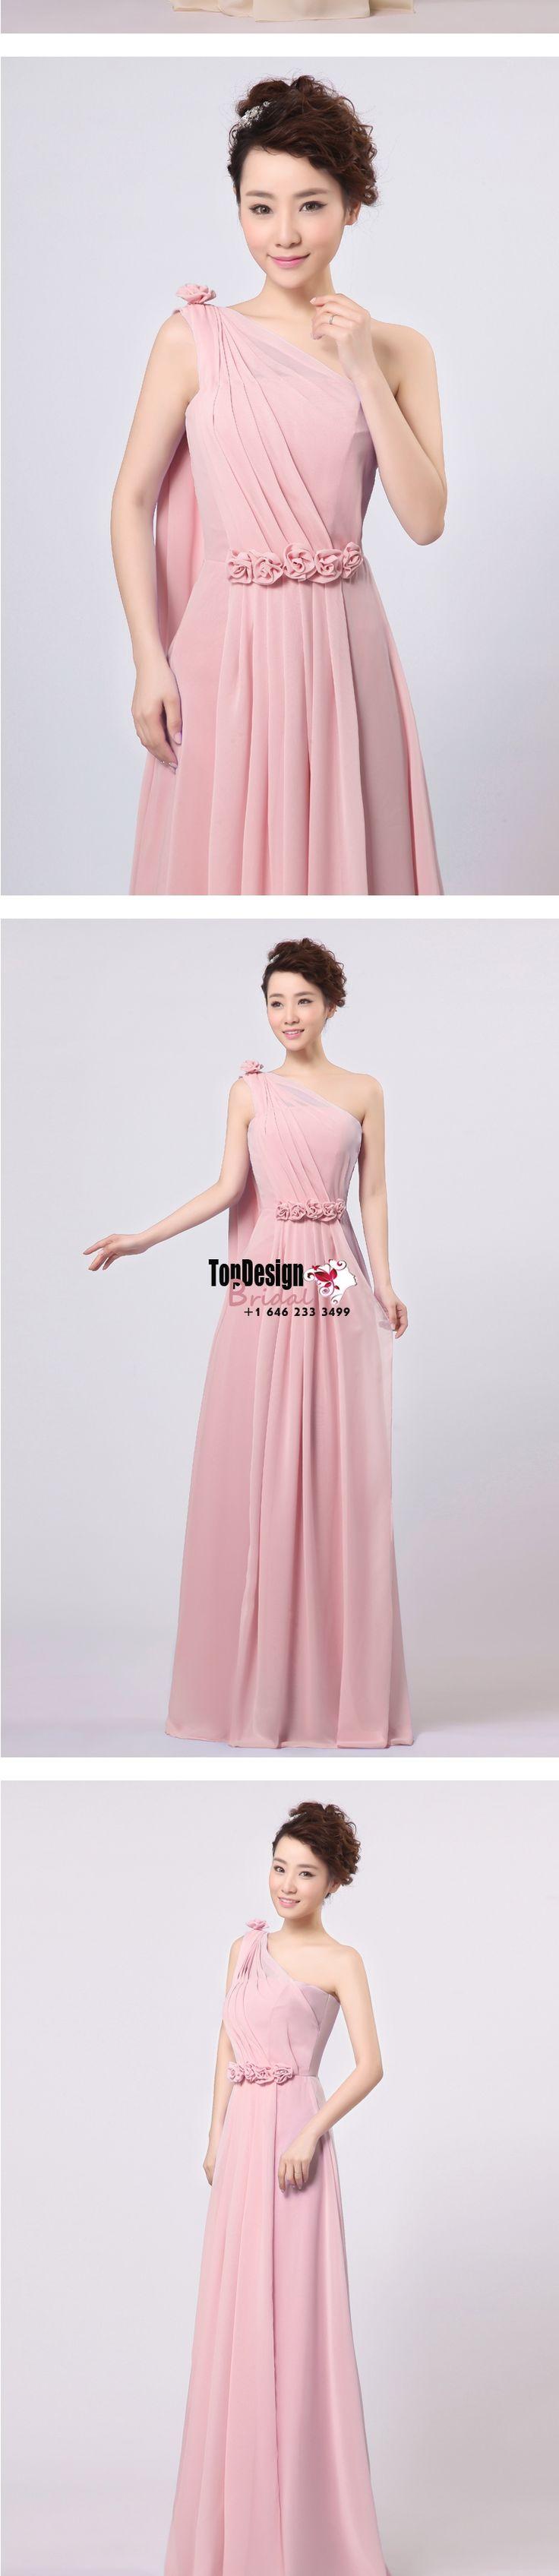 Mejores 340 imágenes de Hi-Low Prom Dress en Pinterest | Vestidos de ...